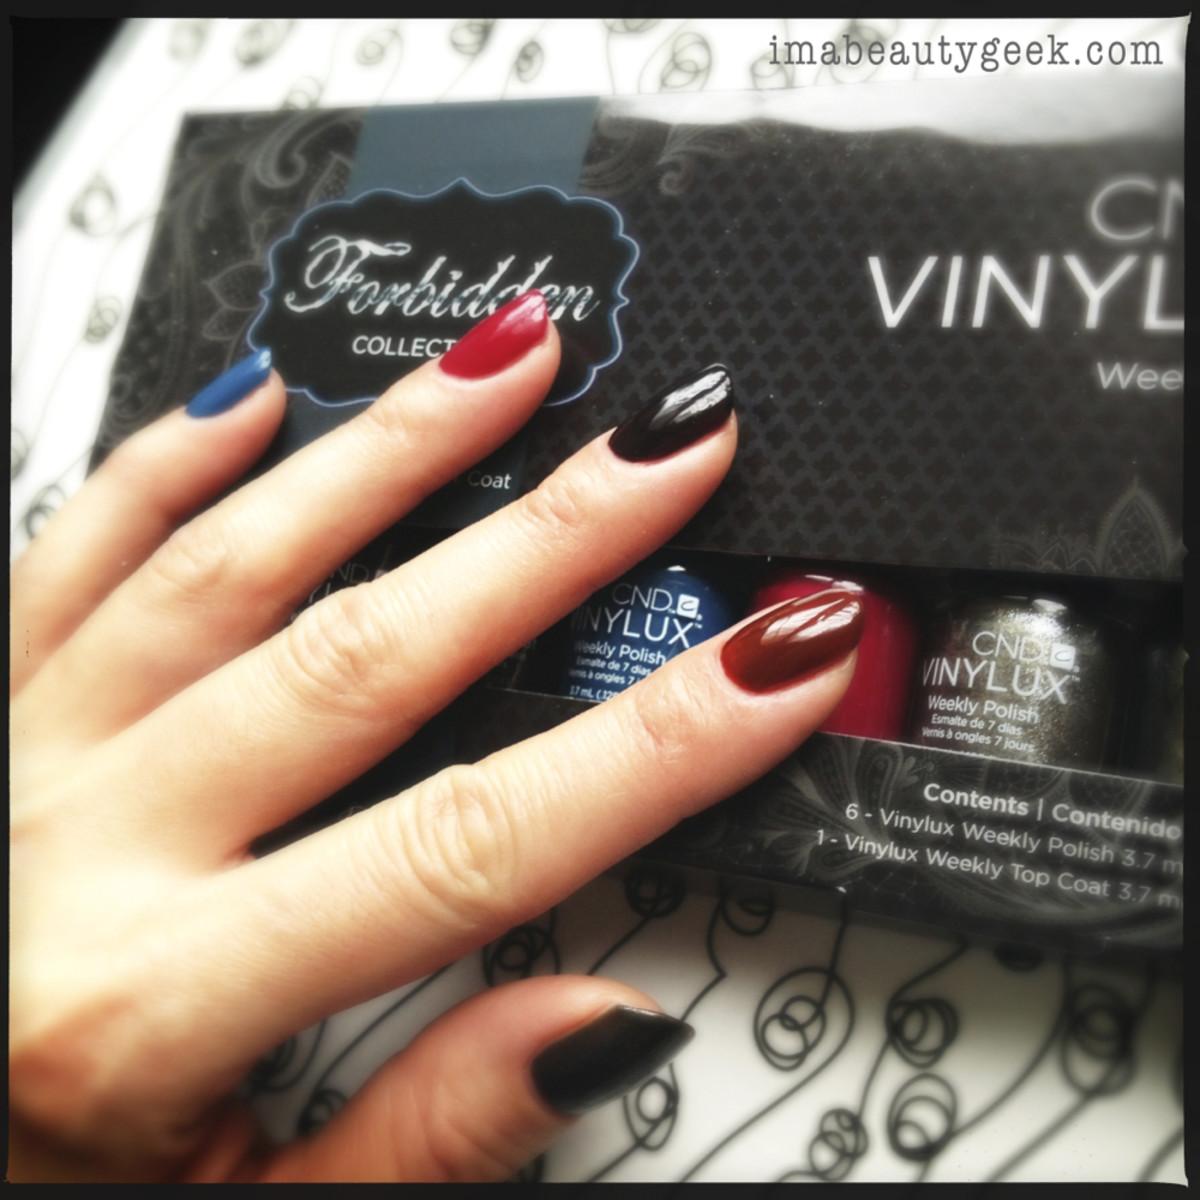 CND Vinylux review_Vinylux Forbidden Collection Left